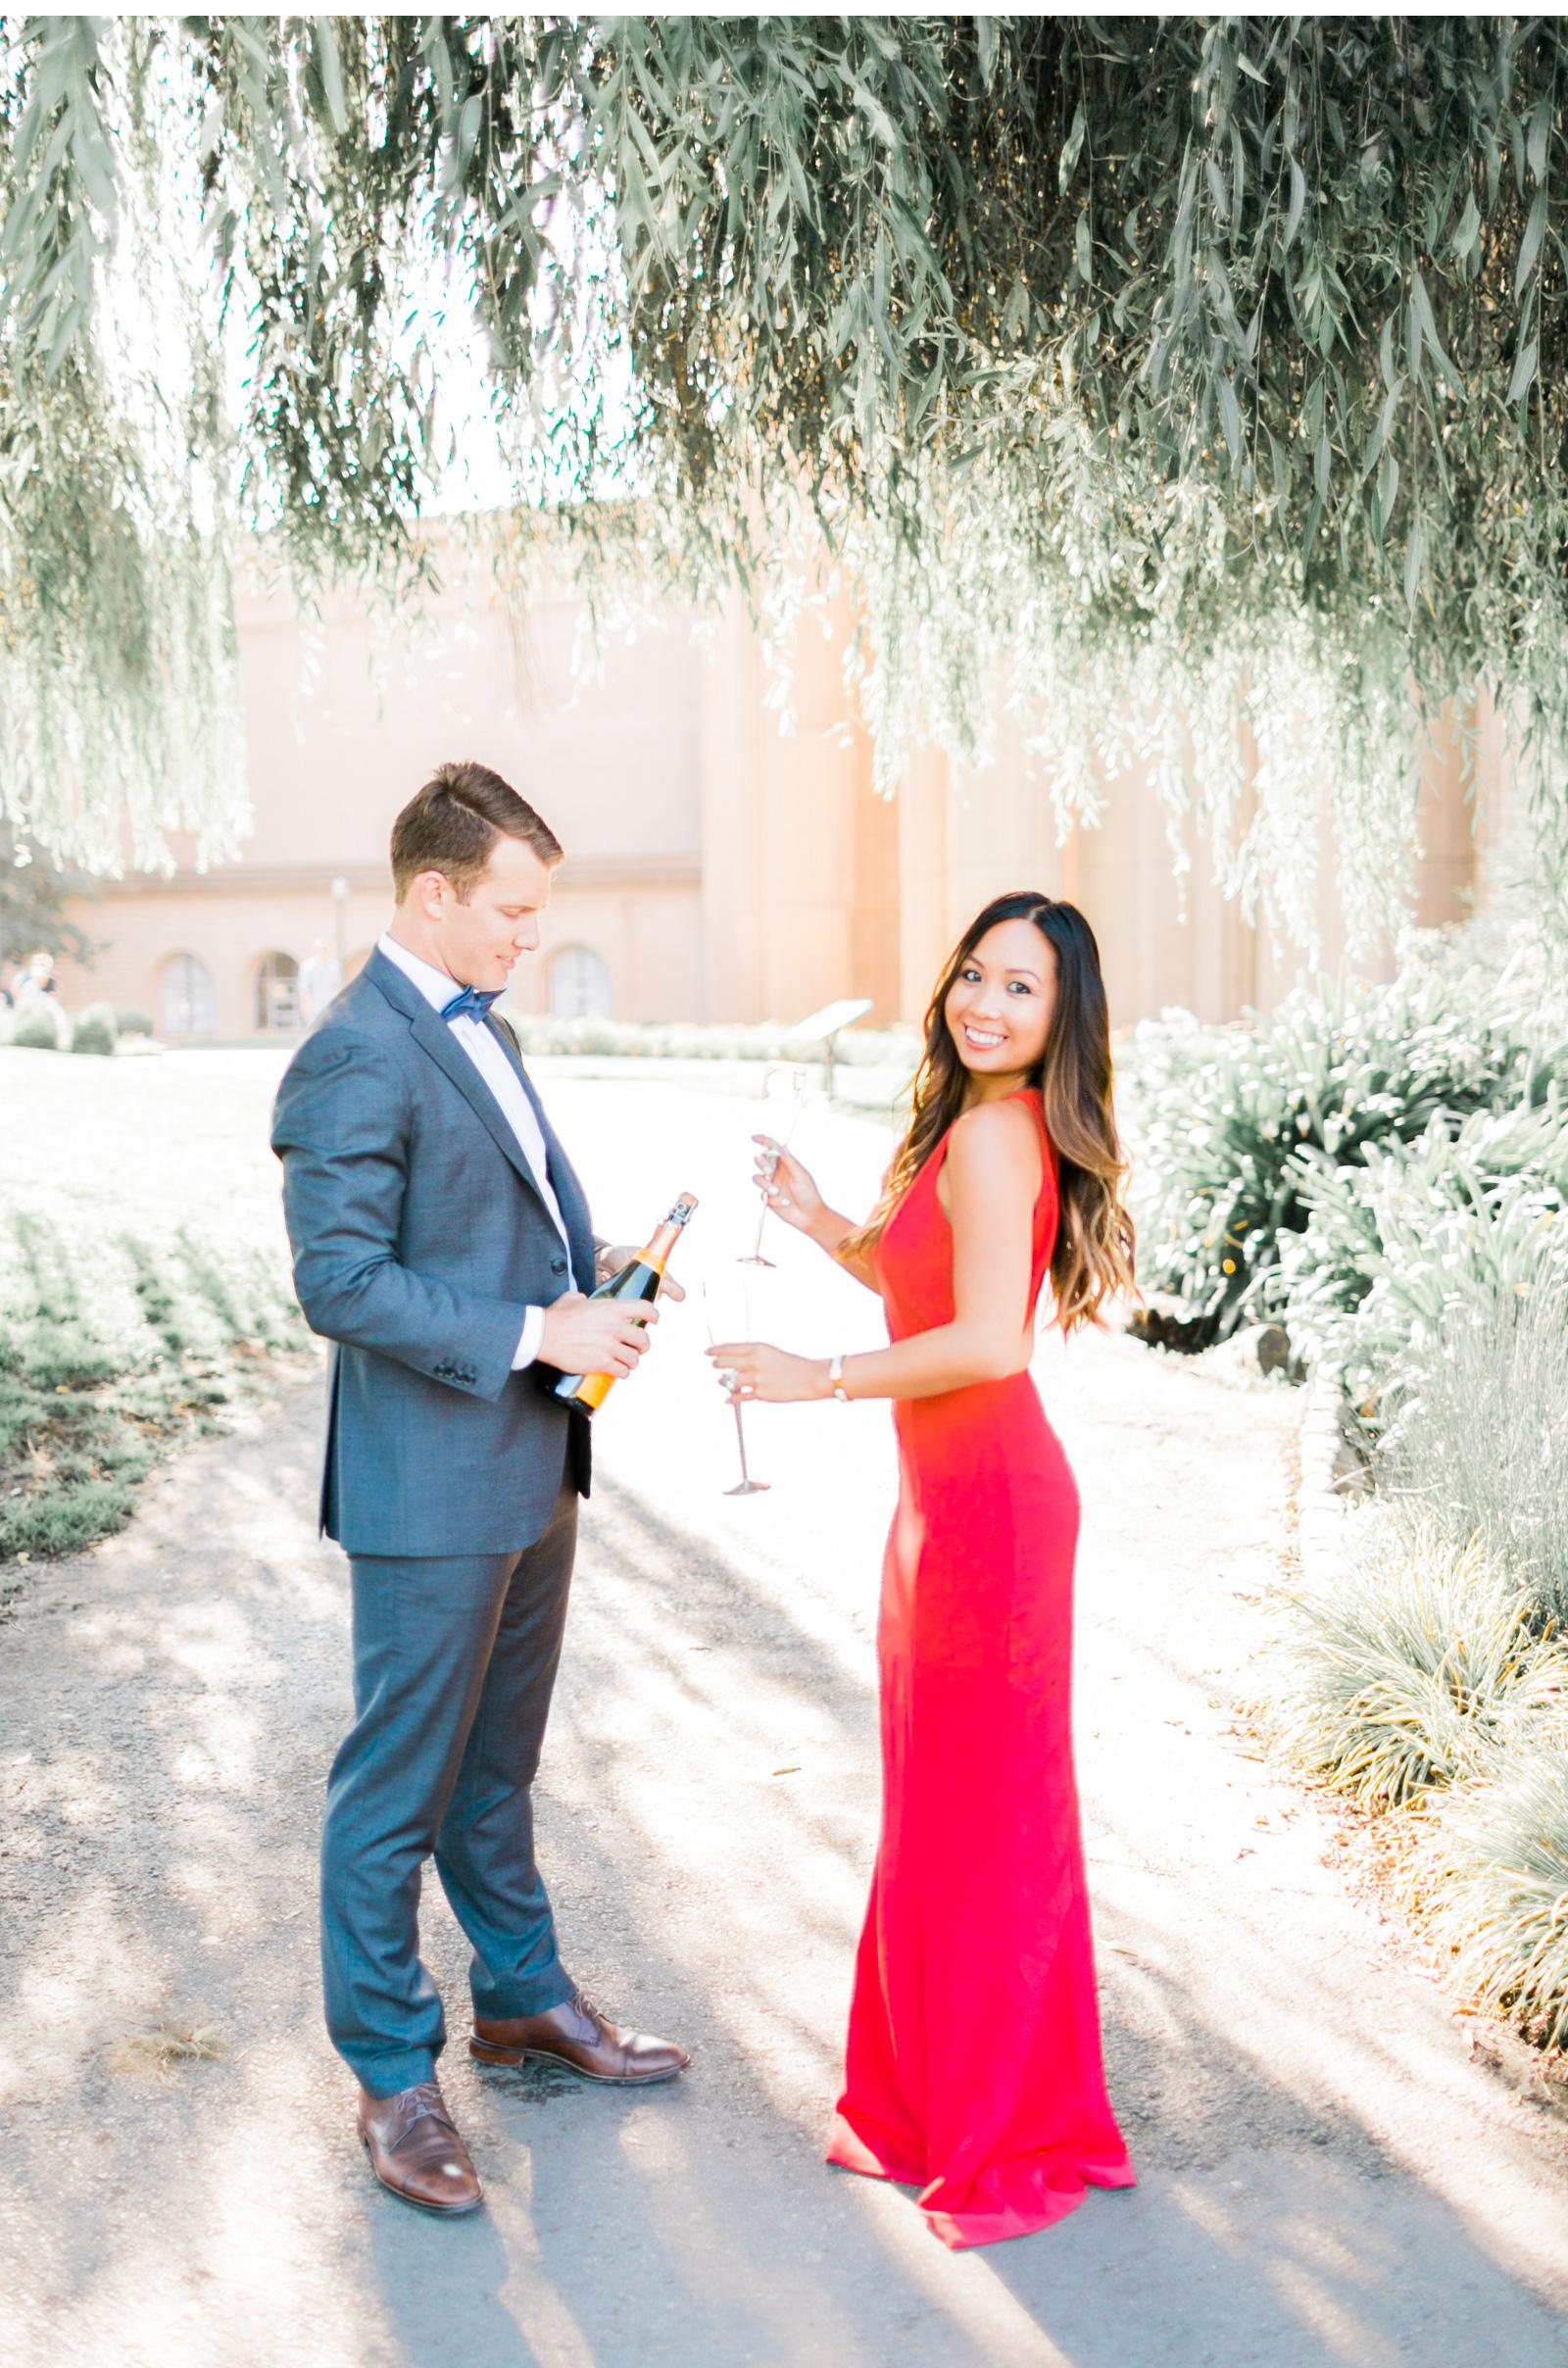 Malibu-Wedding-Photographer-Natalie-Schutt-Photography-Style-Me-Pretty_12.jpg